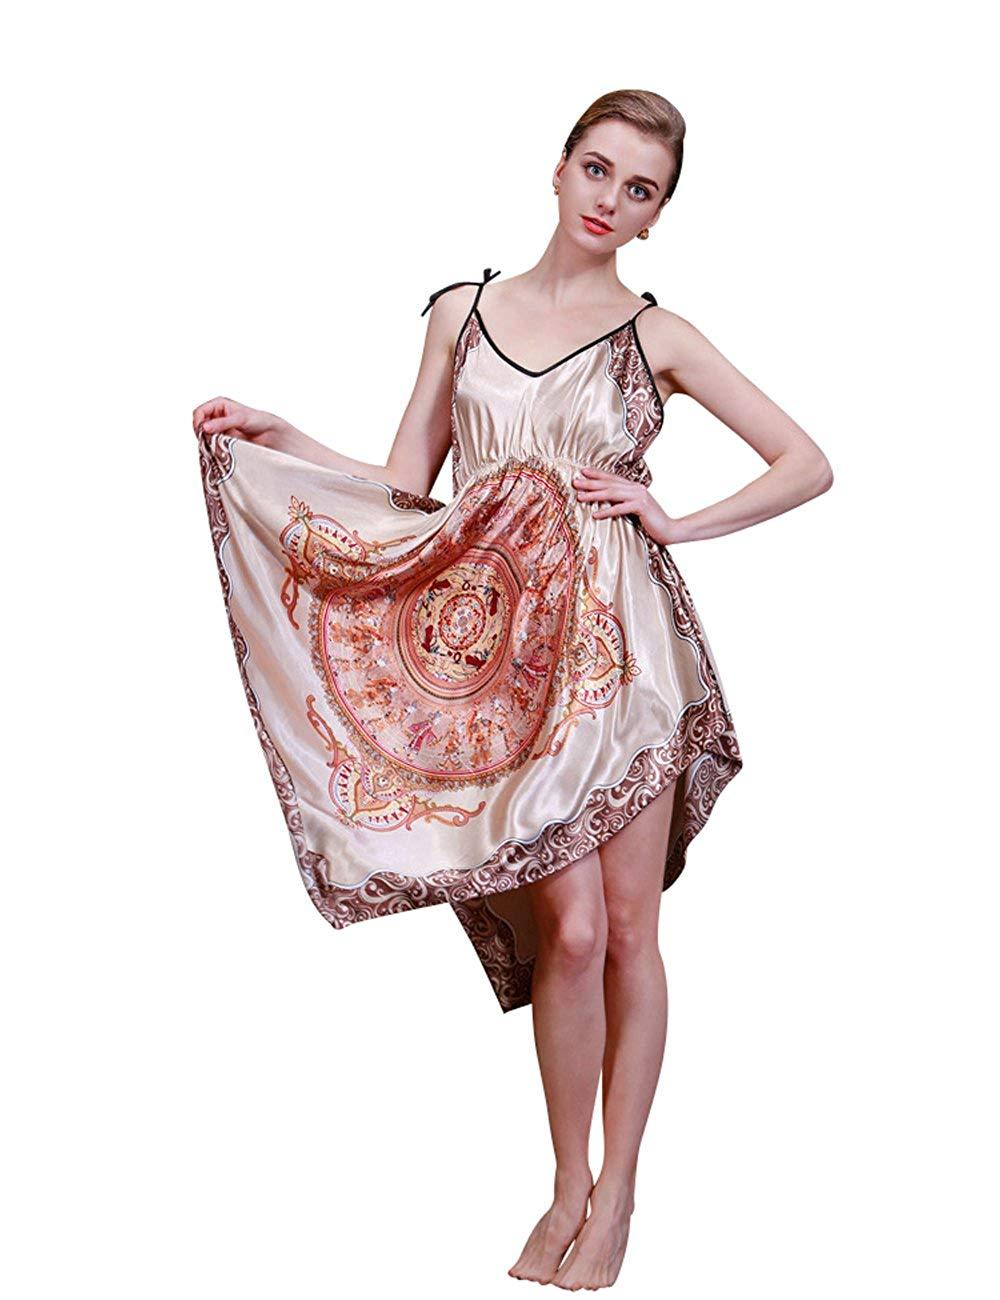 031970ddee Get Quotations · MOKAYA Women s Sleepwear Sleep Shirt Satin Nightgowns  Chemises Nightshirts Slip Dress